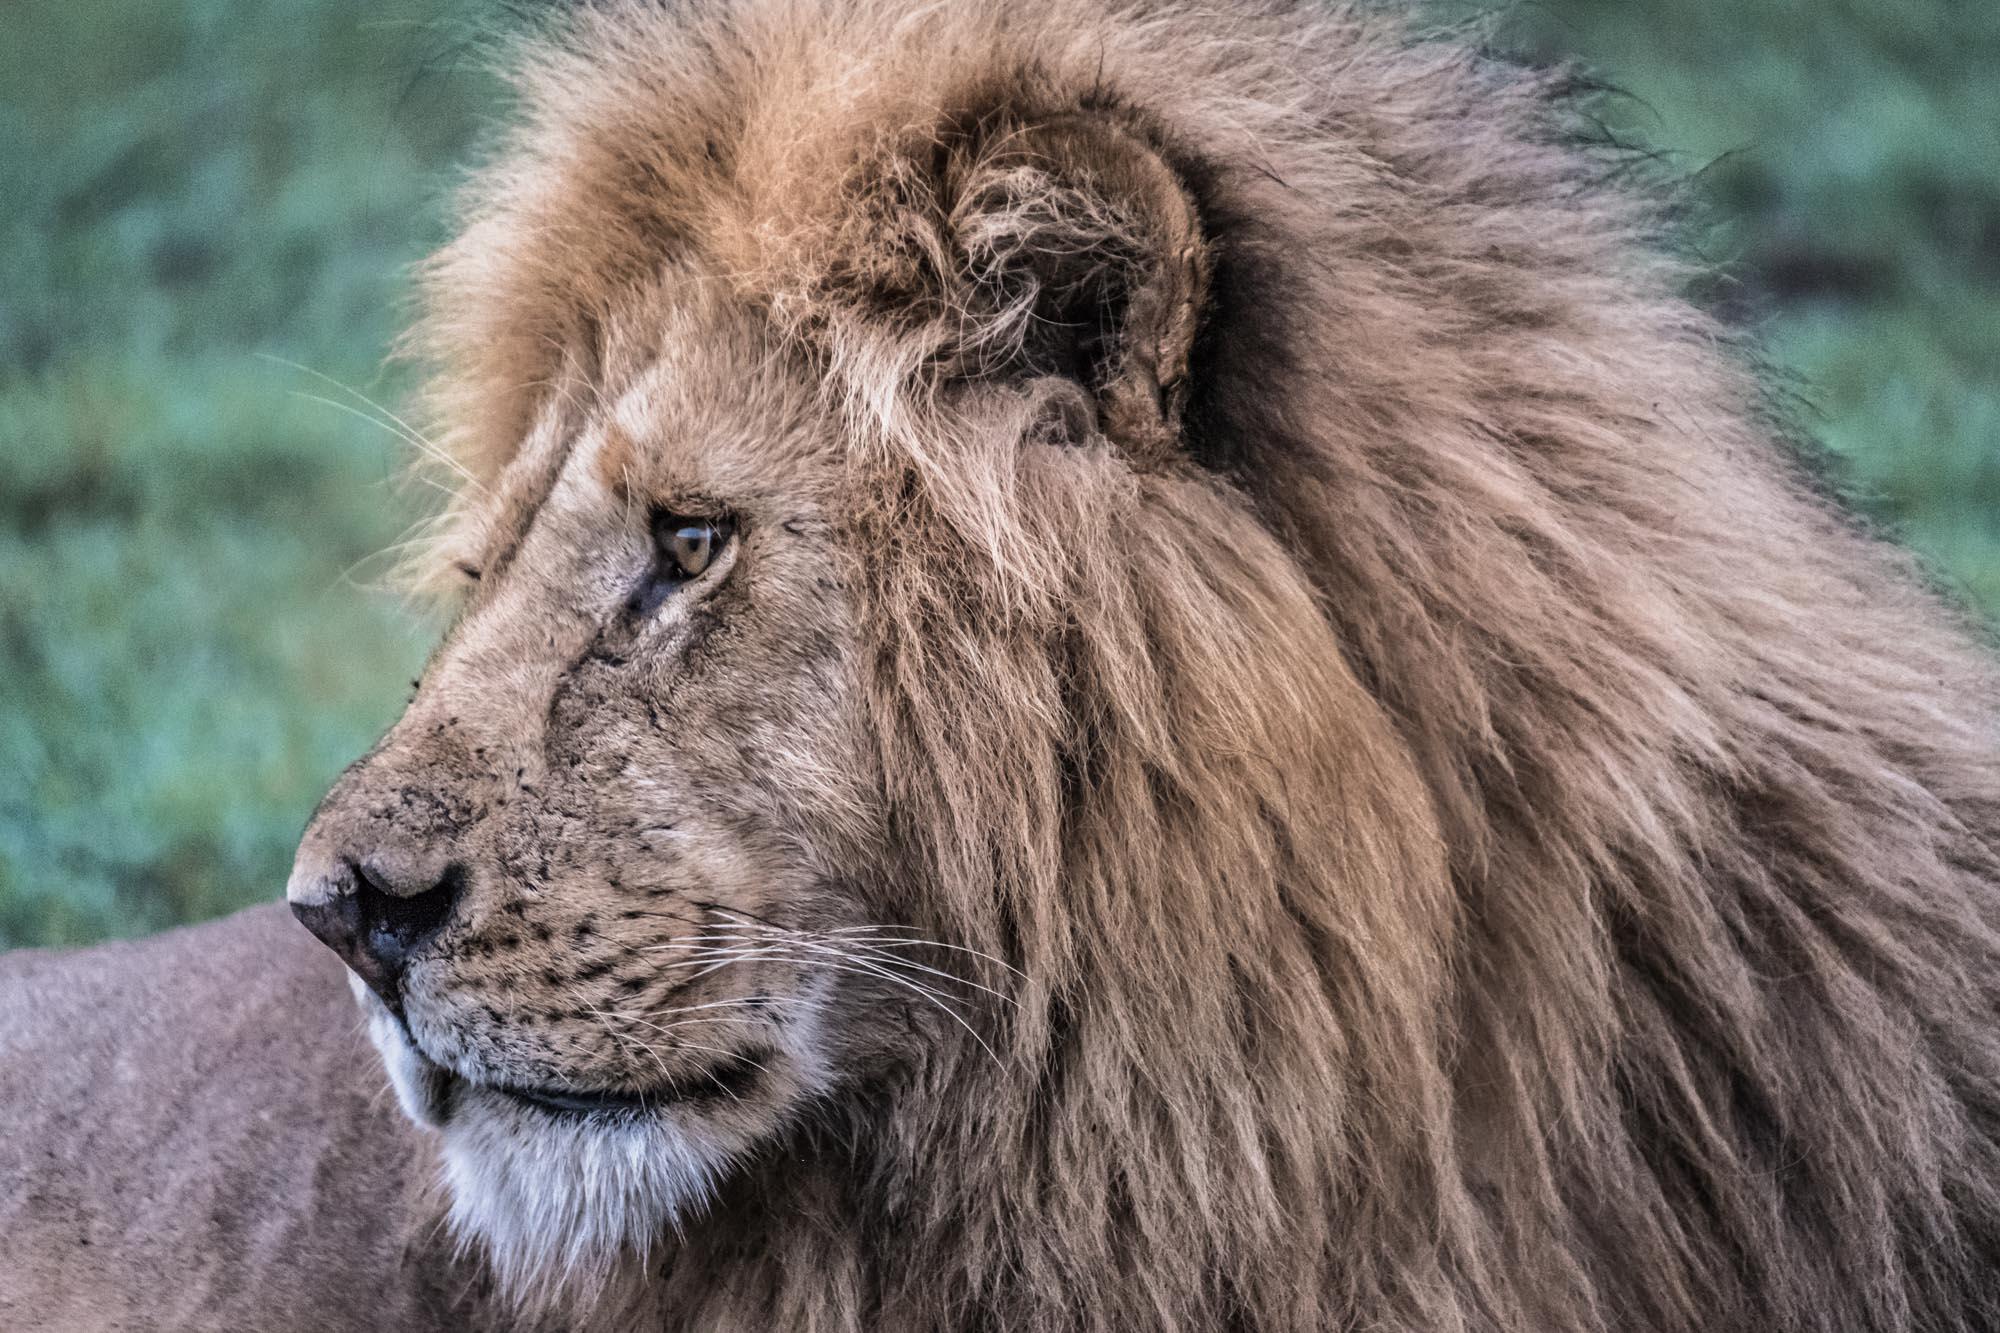 lion-king-mara-kenya-2018-01-15.jpg